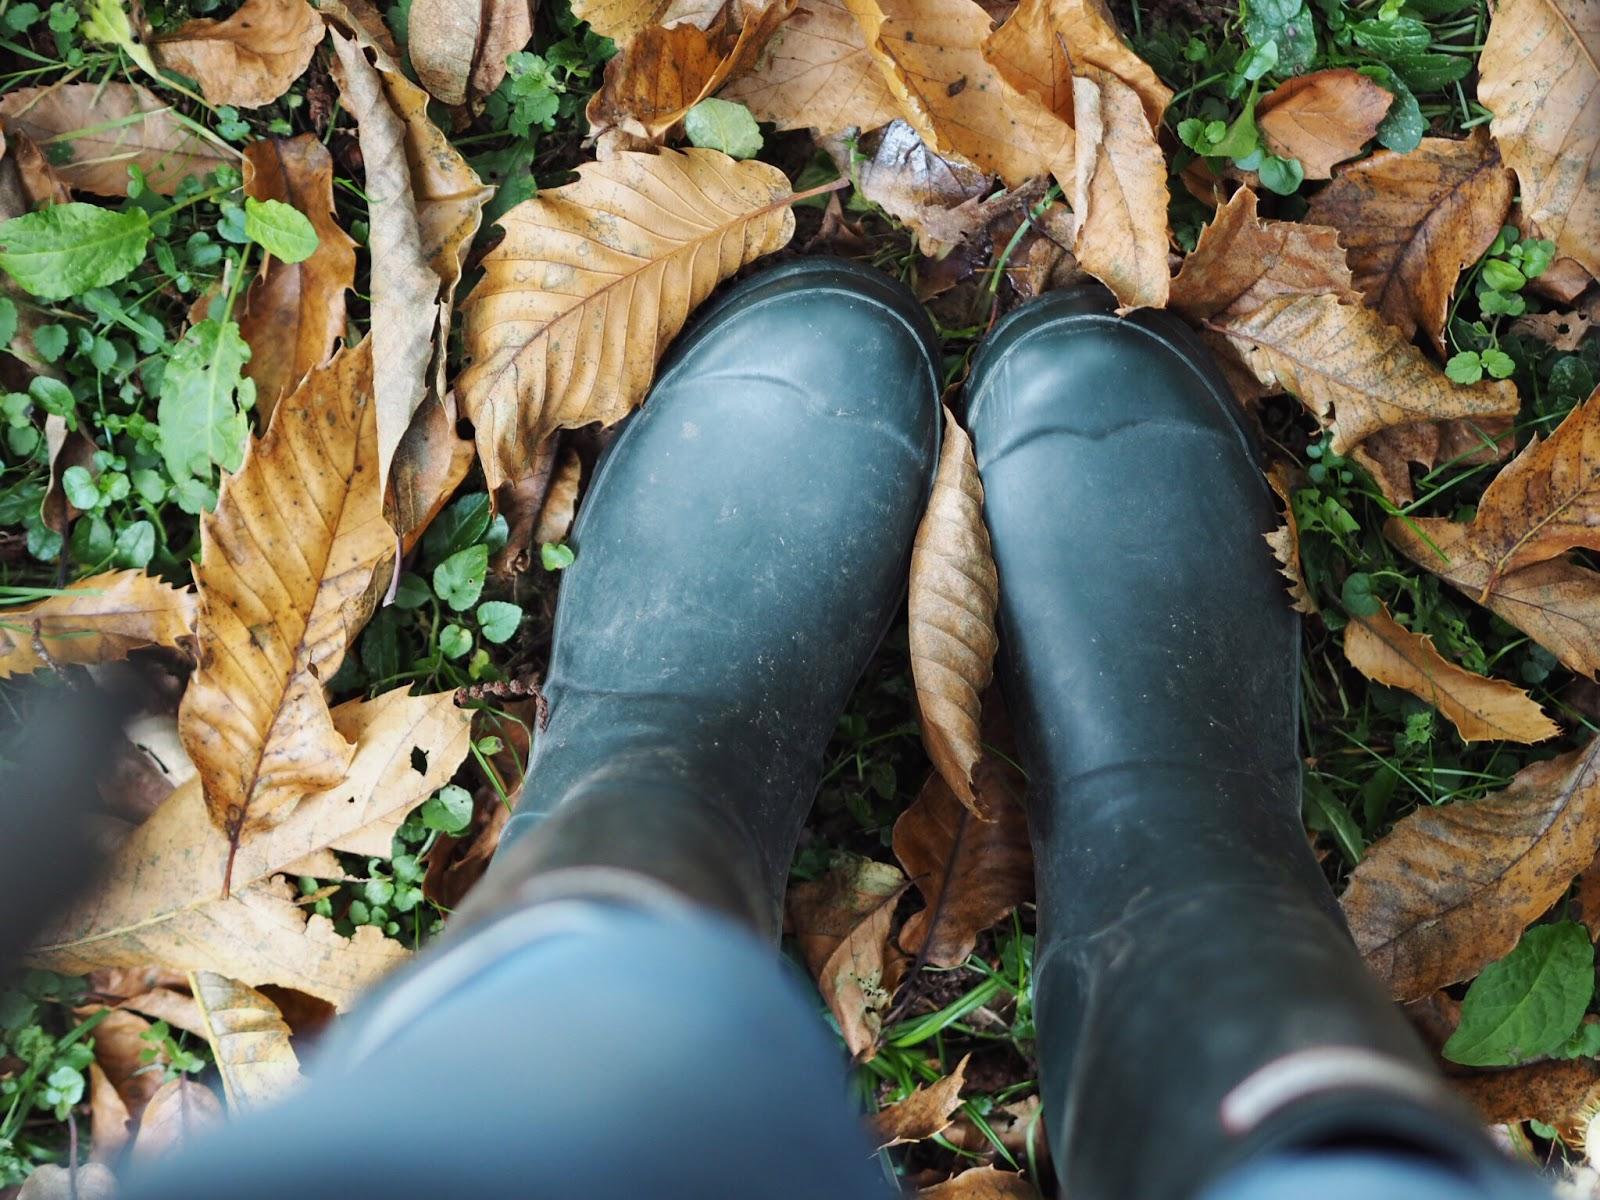 Lifestyle | Autumn Bucket List and Goals Westonbirt Arboretum